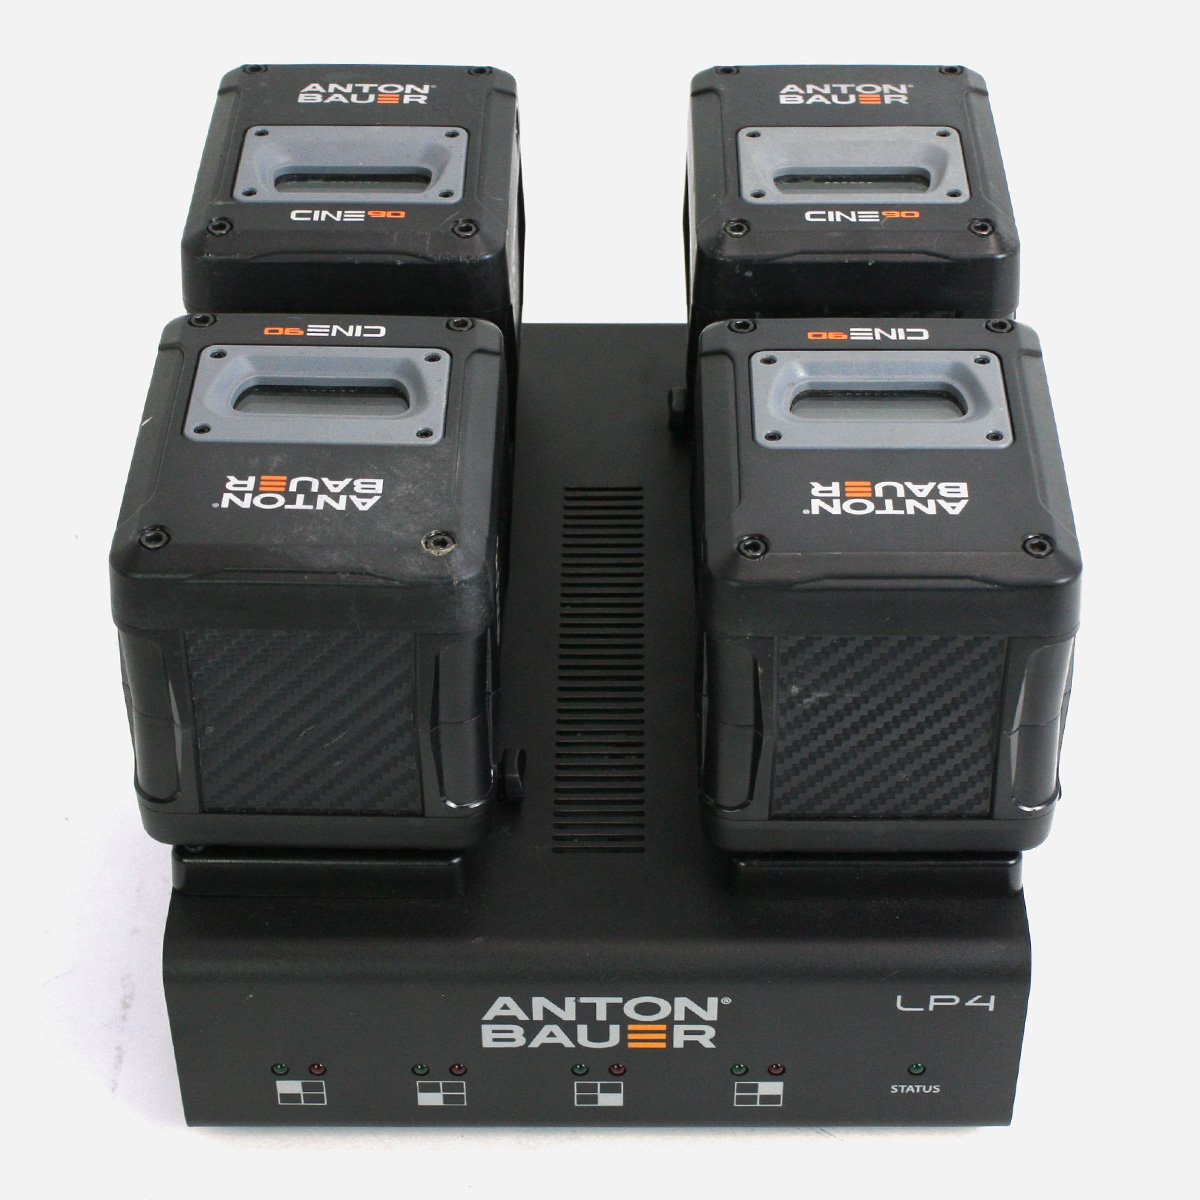 Anton Bauer LP4 Quad charger with 4 Cine 90 VM V-Mount Batteries